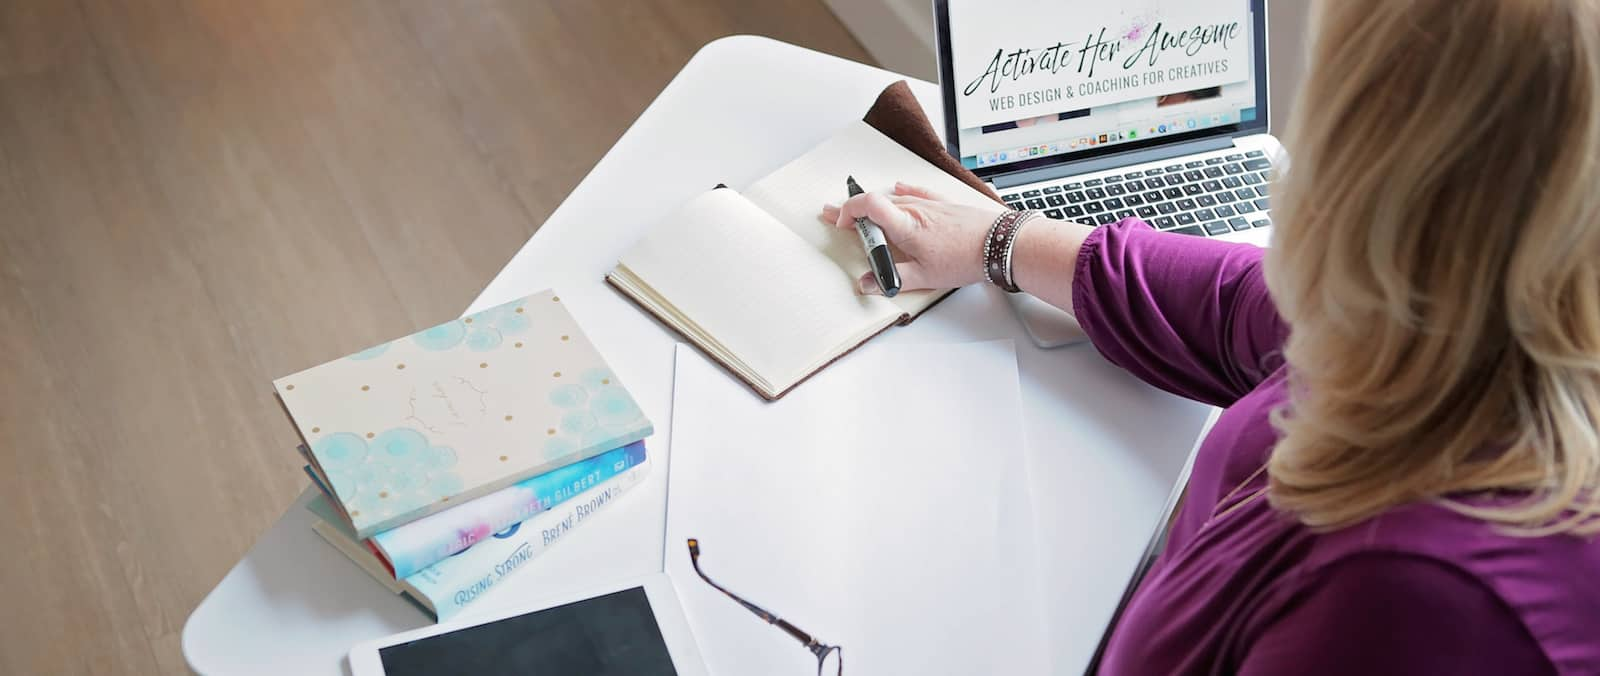 Krista Smith, Wordpress Web Design and Development for women entrepreneurs